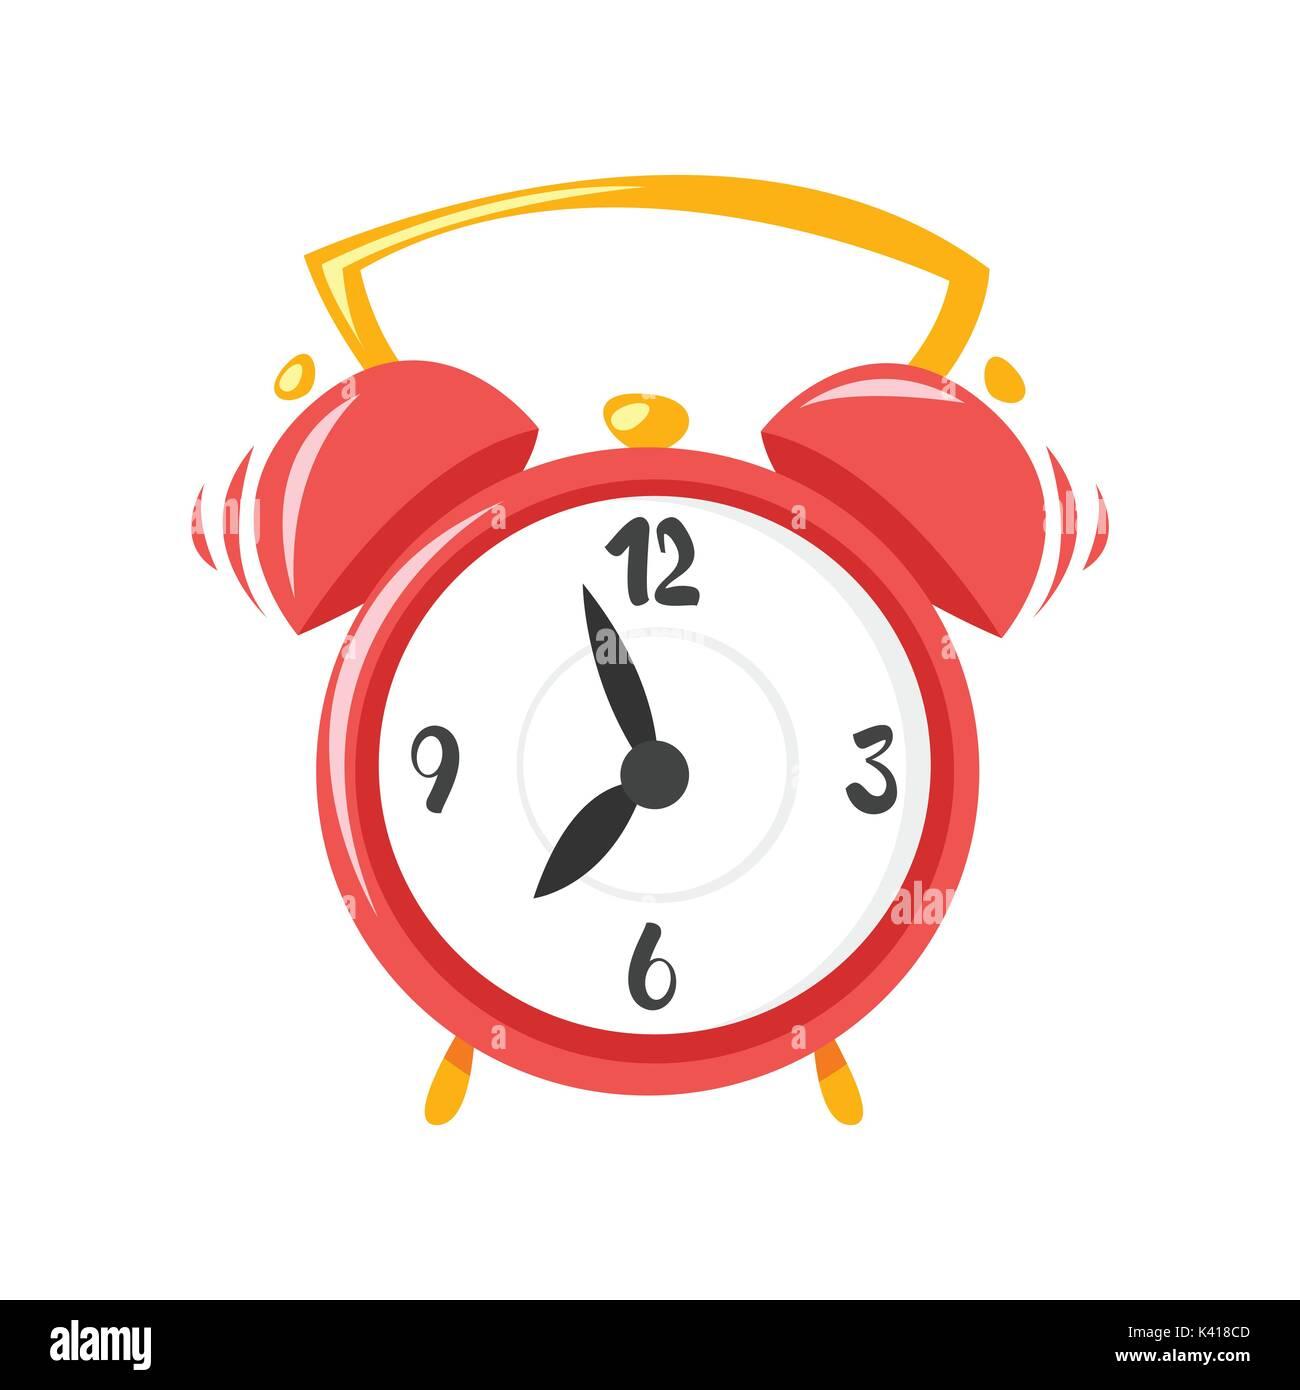 Vector cartoon style illustration of alarm clock  Icon for